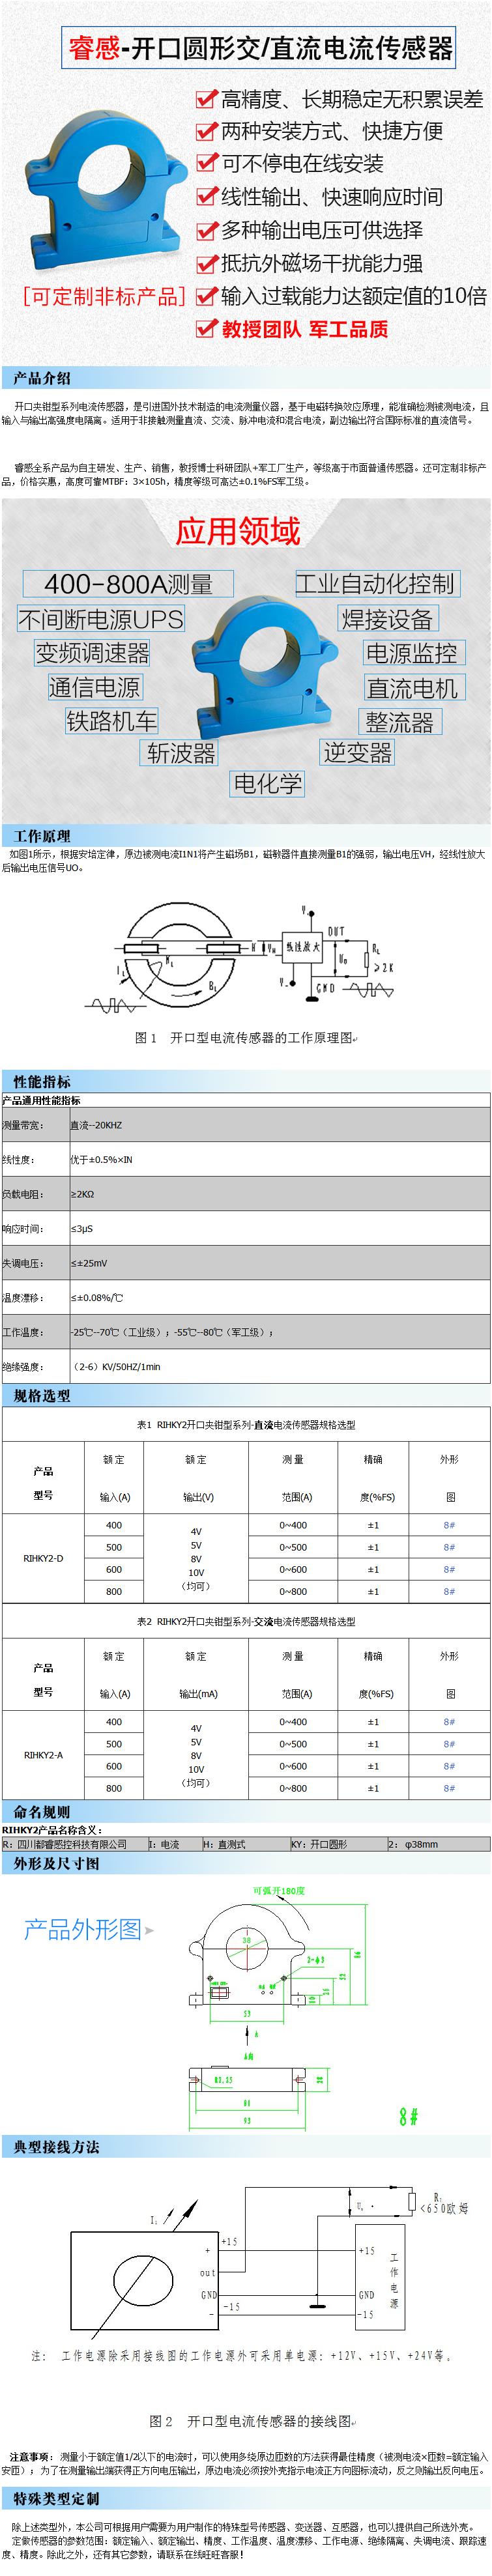 800A霍尔电流传感器 钳型圆孔交直流电流传感器军工级 输出5V_10V-淘宝网.png